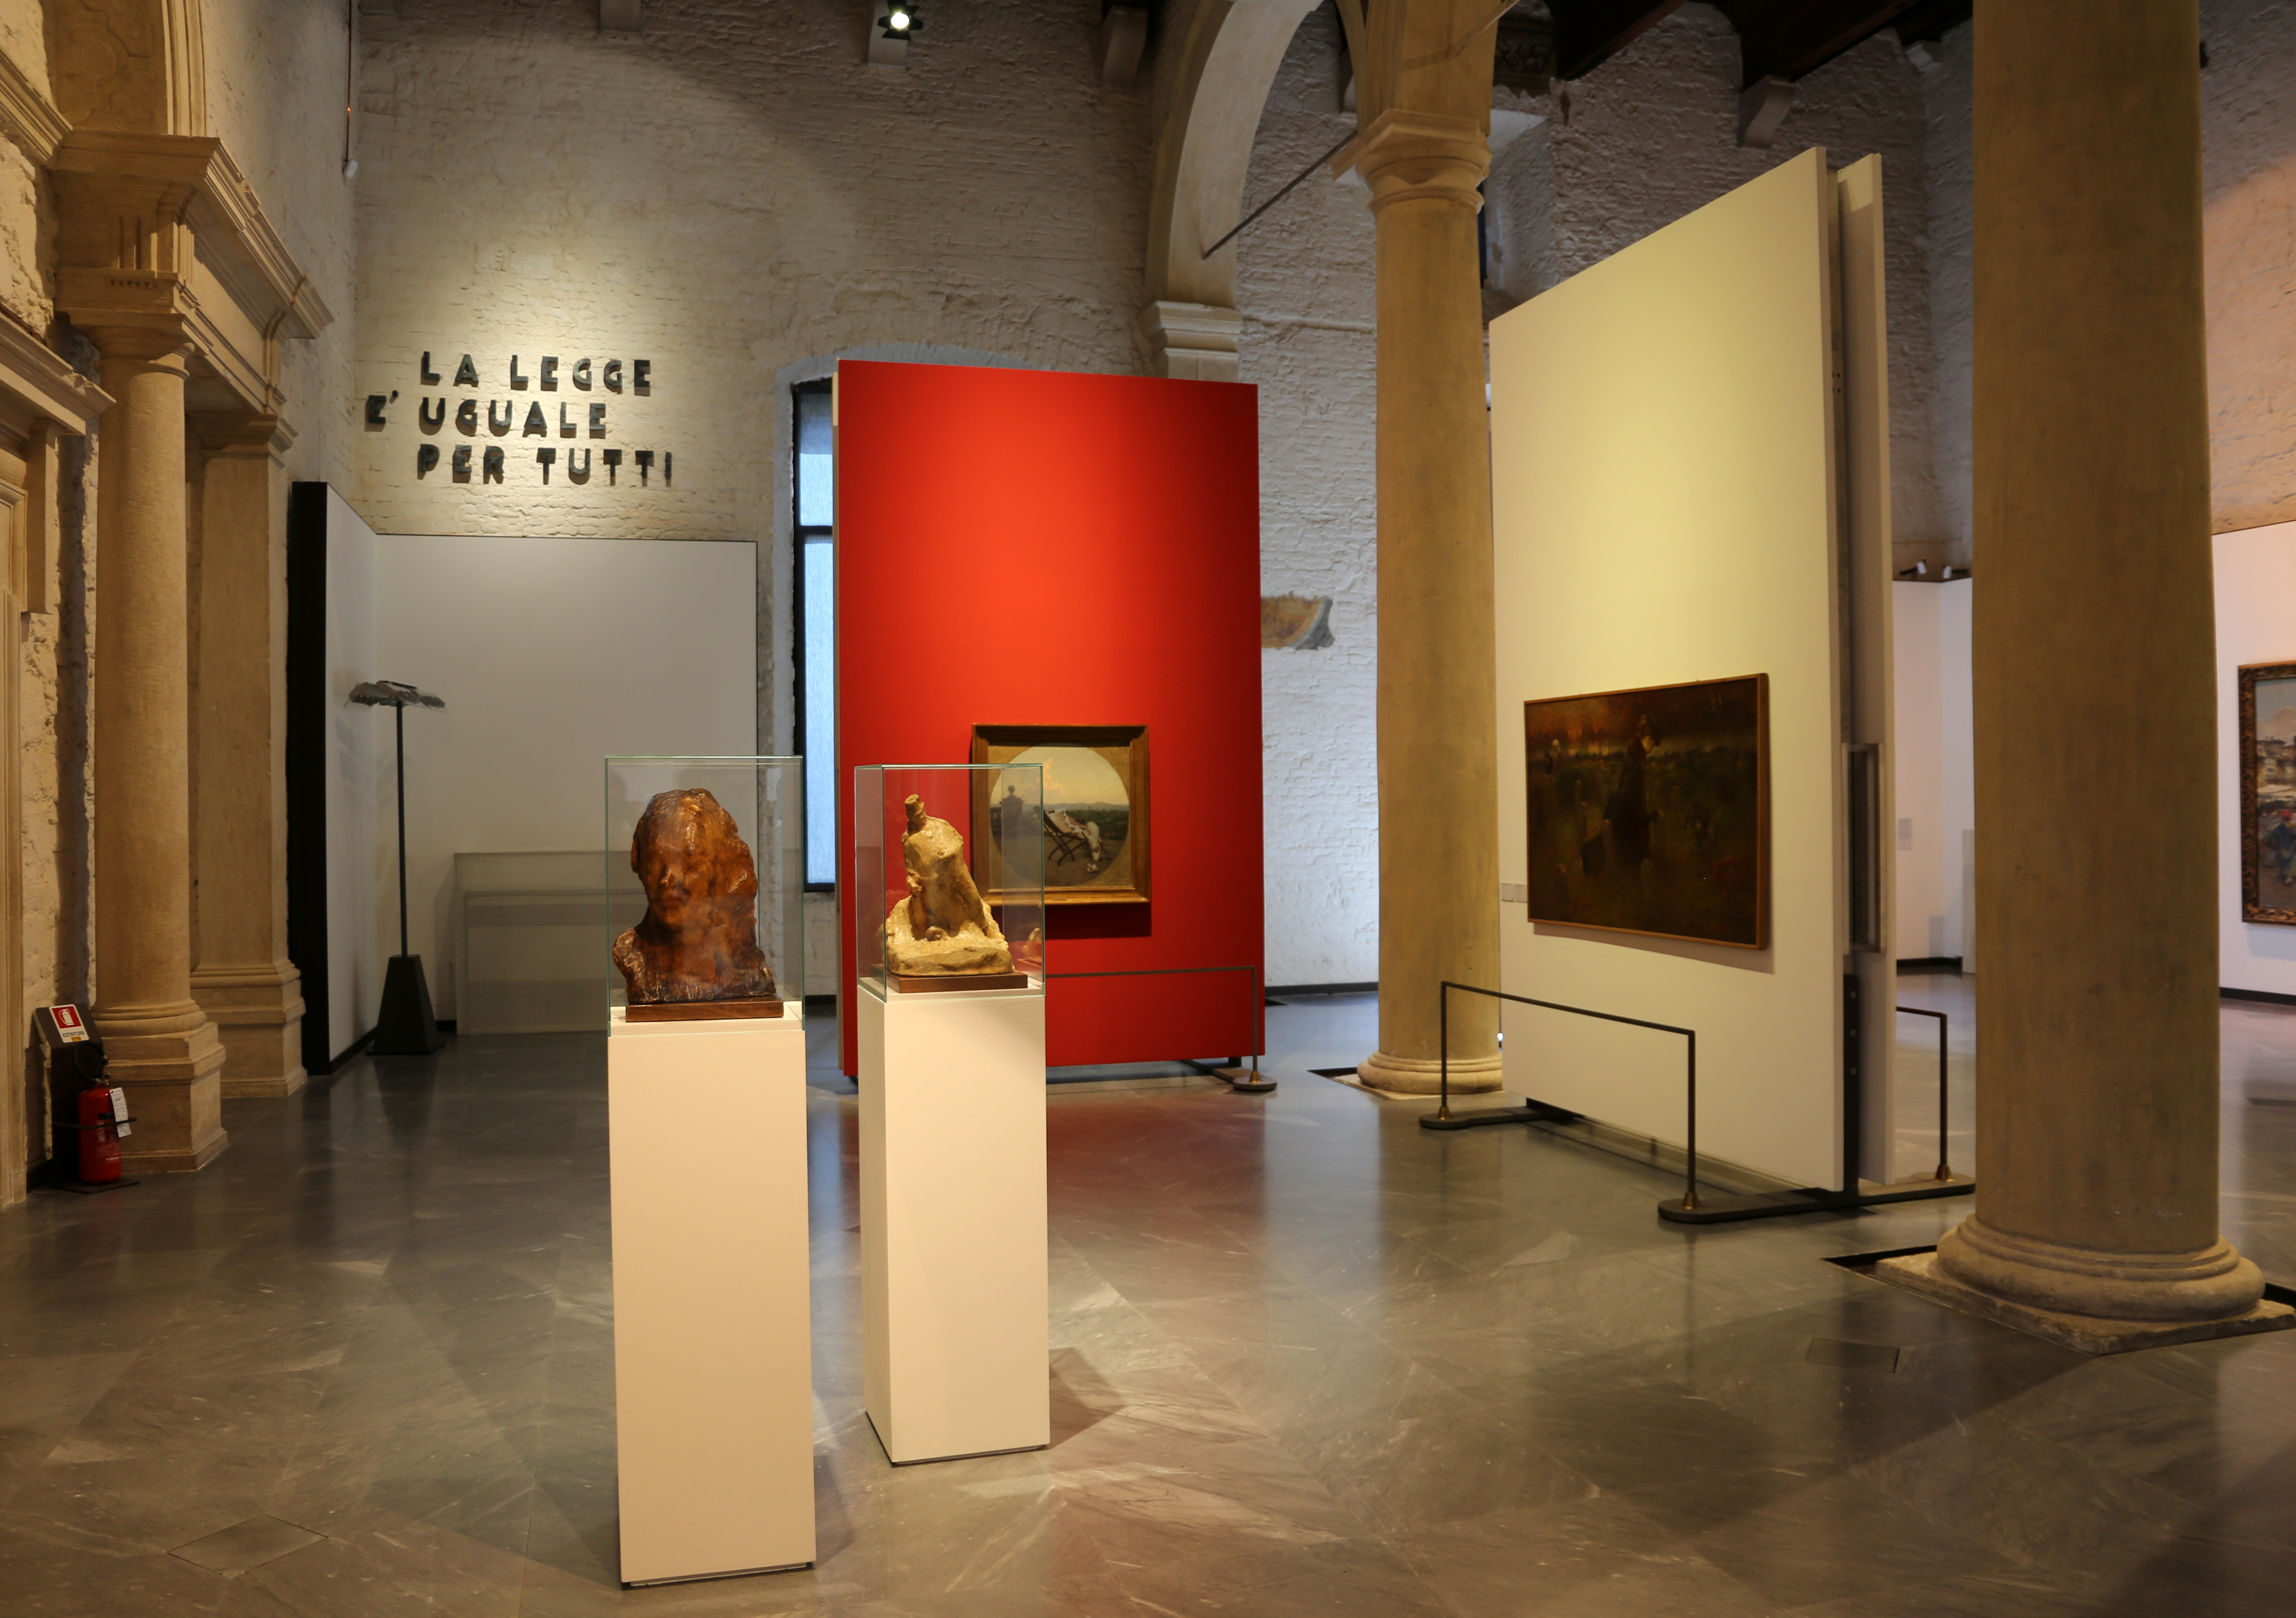 Design Per Tutti Com file:verona, galleria d'arte moderna, interno 02